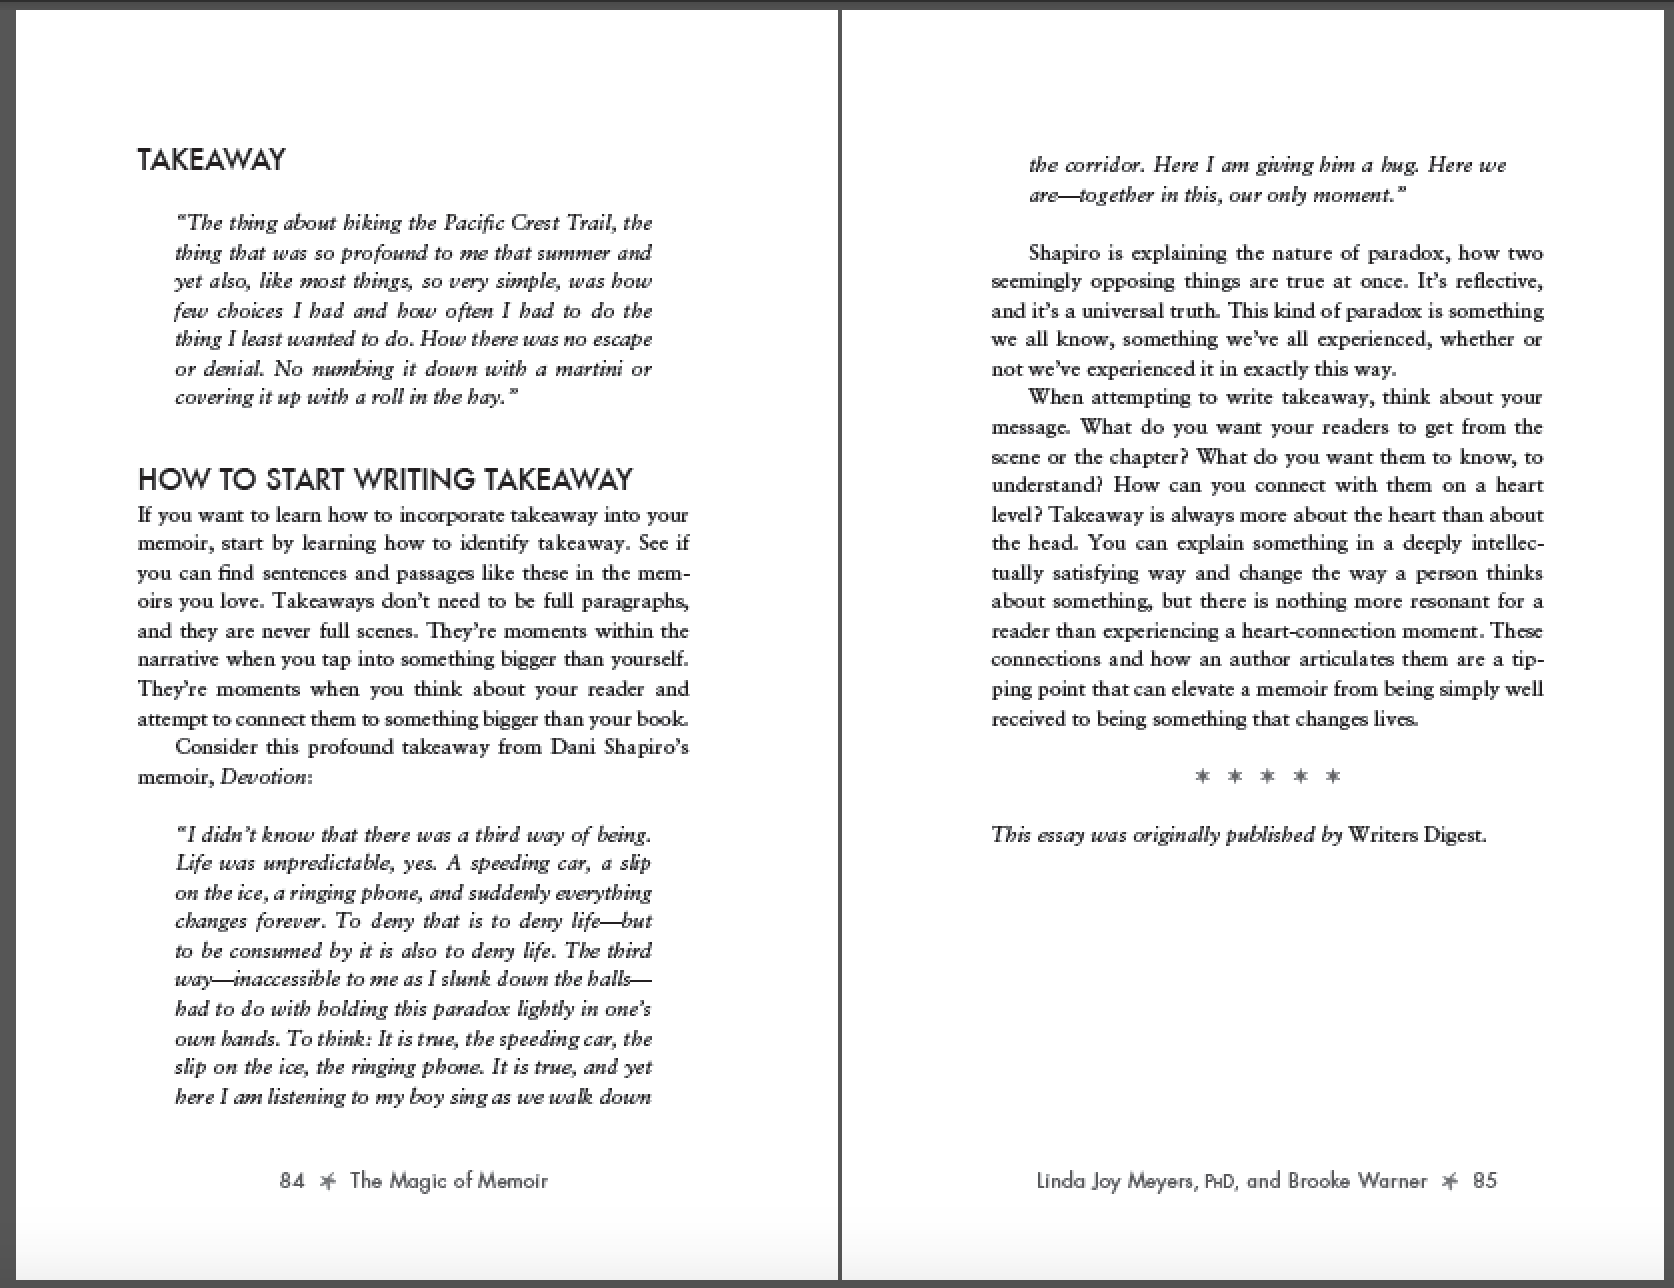 examples of memoir essays jacob aall bonnevie bjerknes  sample examples of memoir essays